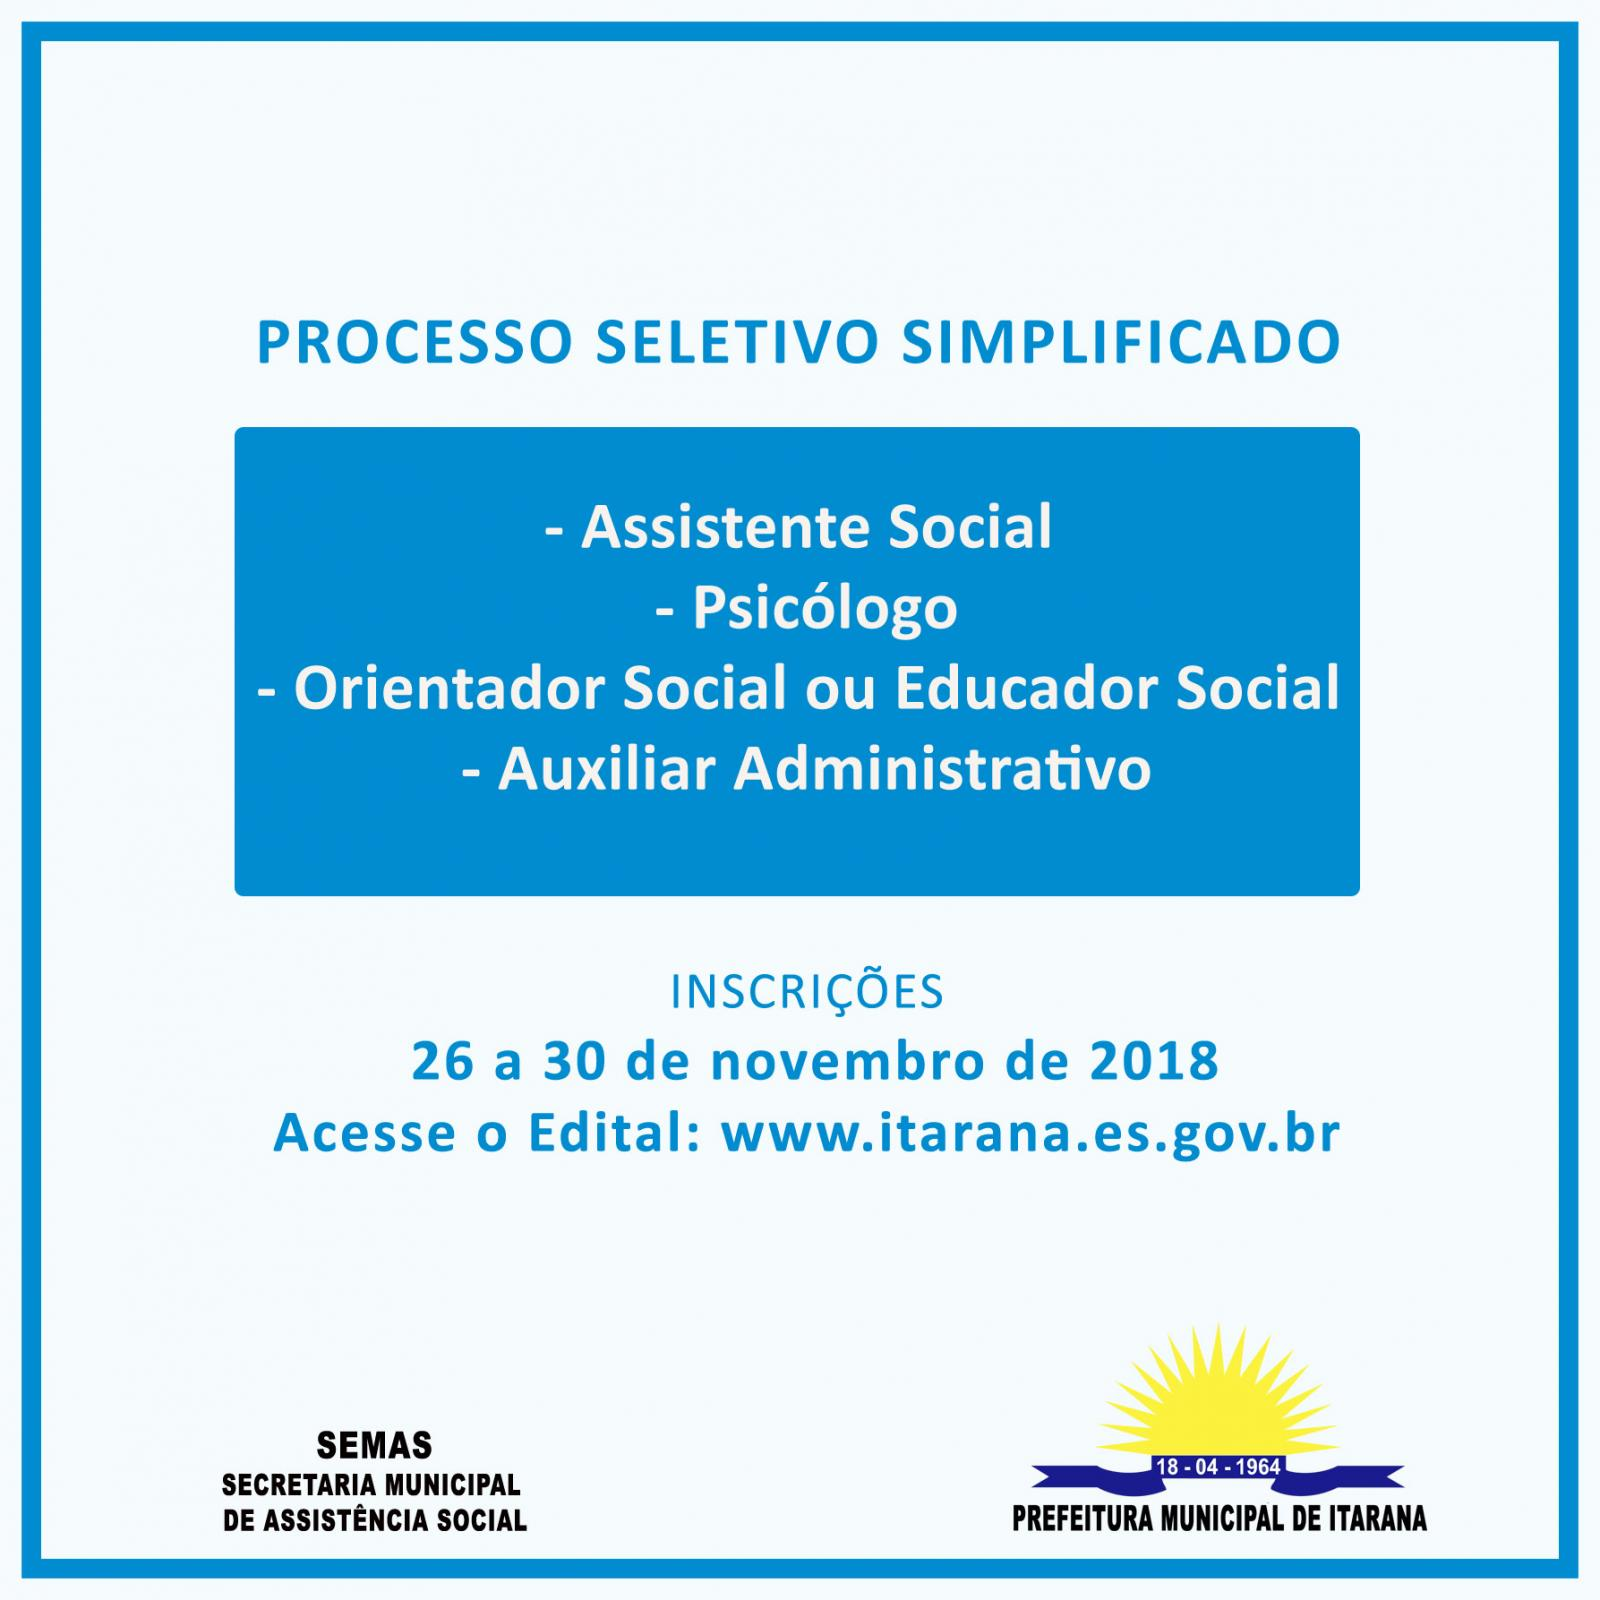 Secretaria de Assistência Social de Itarana abre processo seletivo simplificado